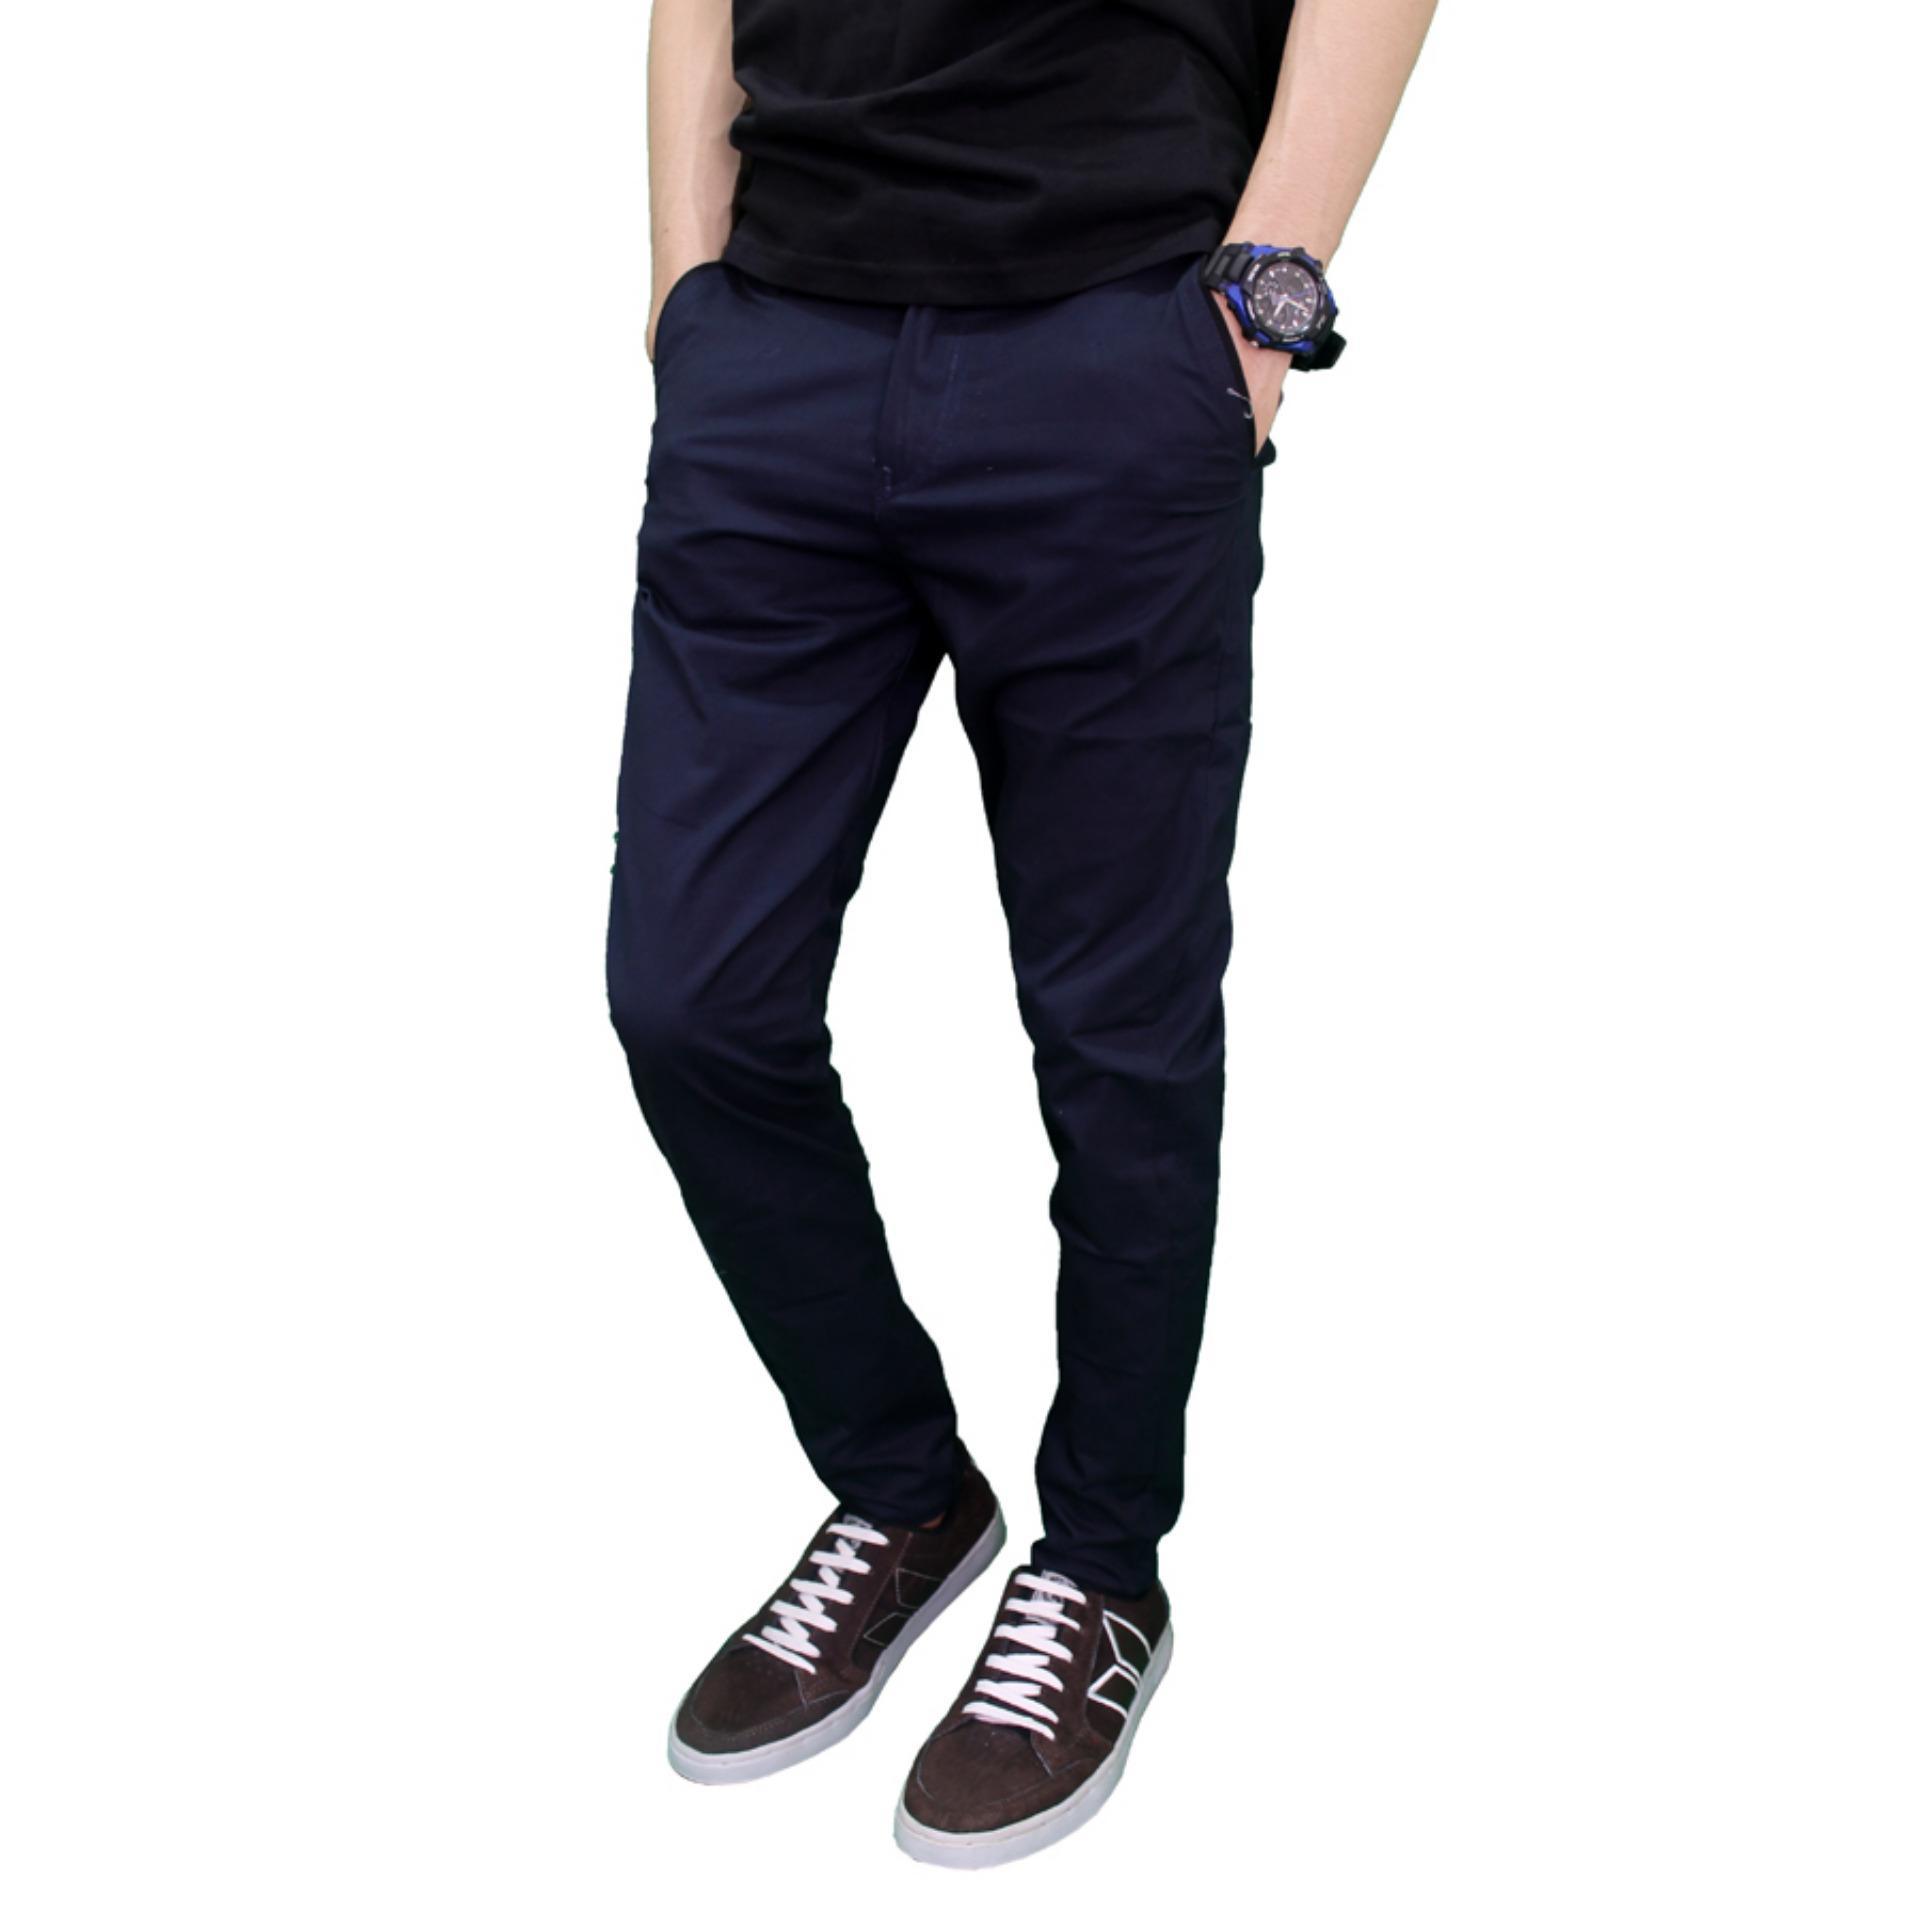 Gudang Fashion Celana Saku Tempel Jeans Dongker Daftar Harga Jogger Panjang Pria Denim Raf 07900900 Navy 32 Jual Terbaru Lazada Co Id Source